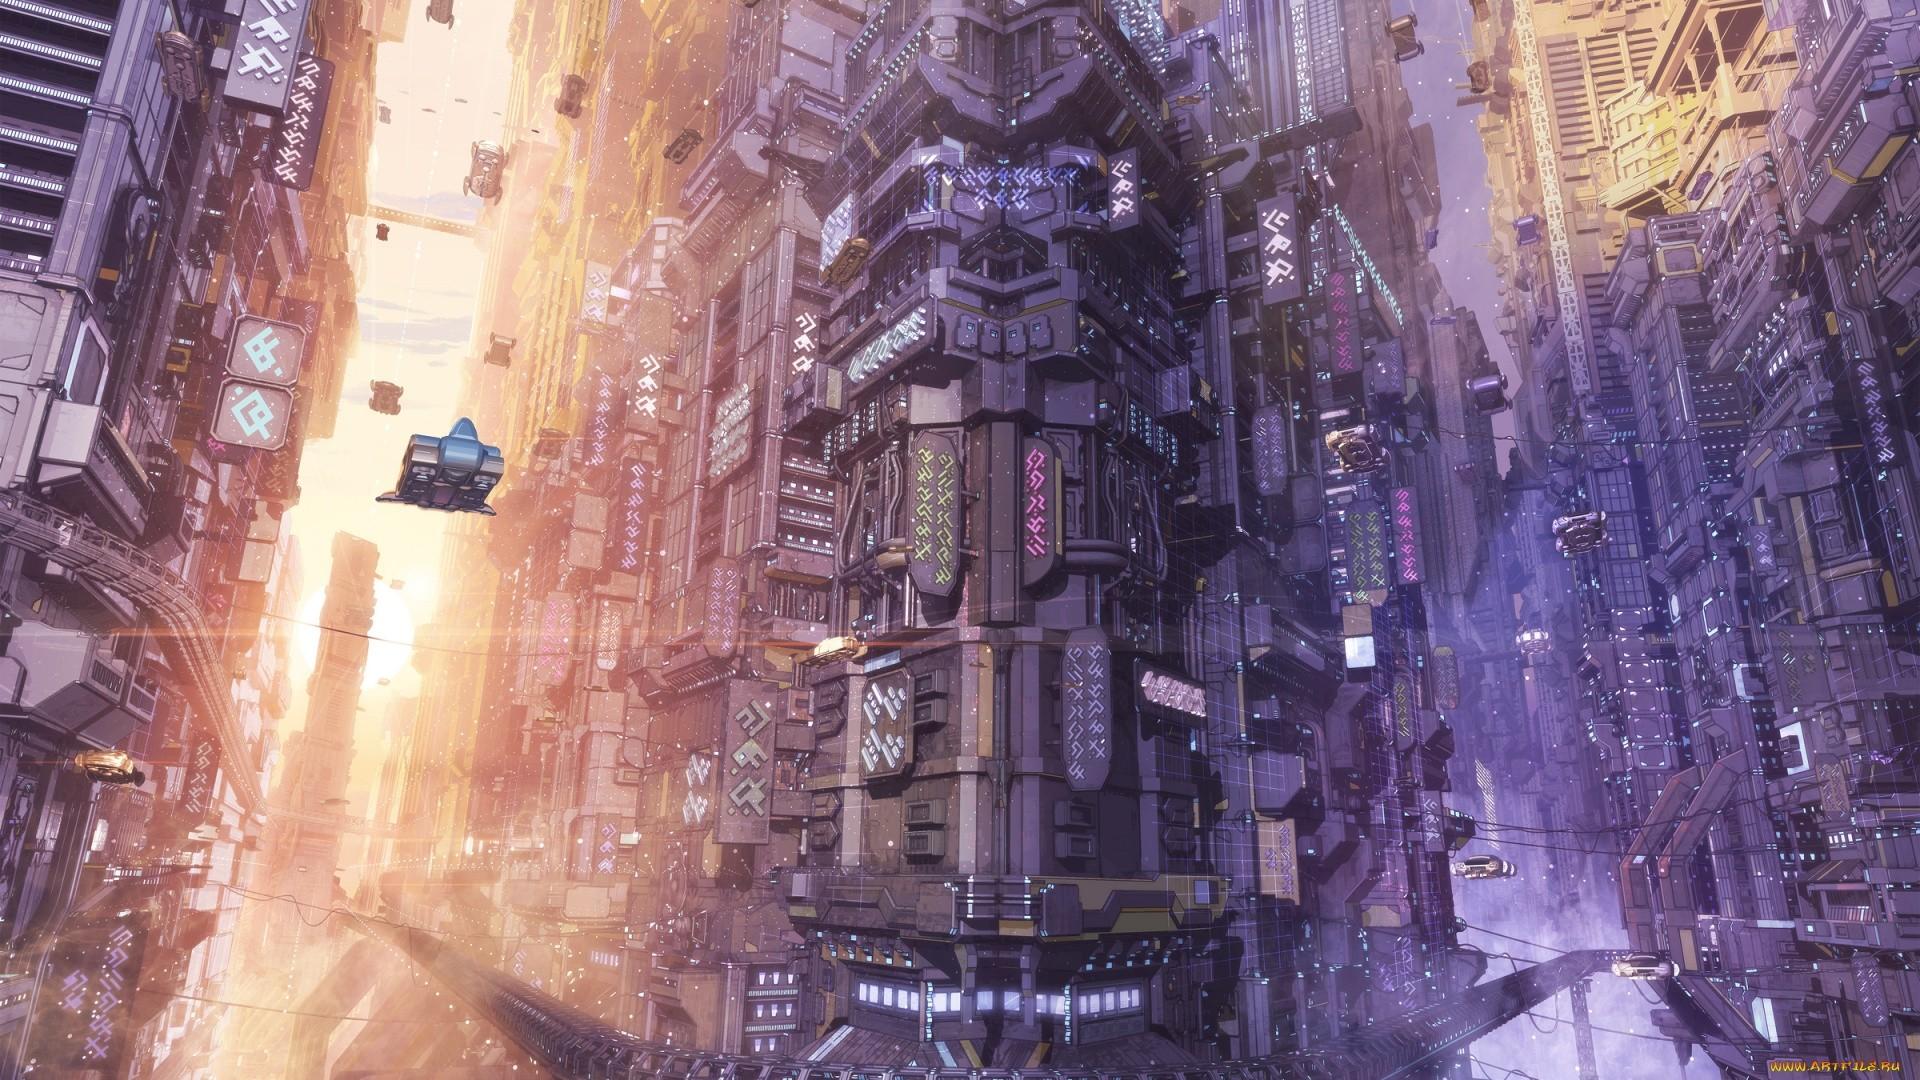 Cyberpunk City Art wallpaper photo hd